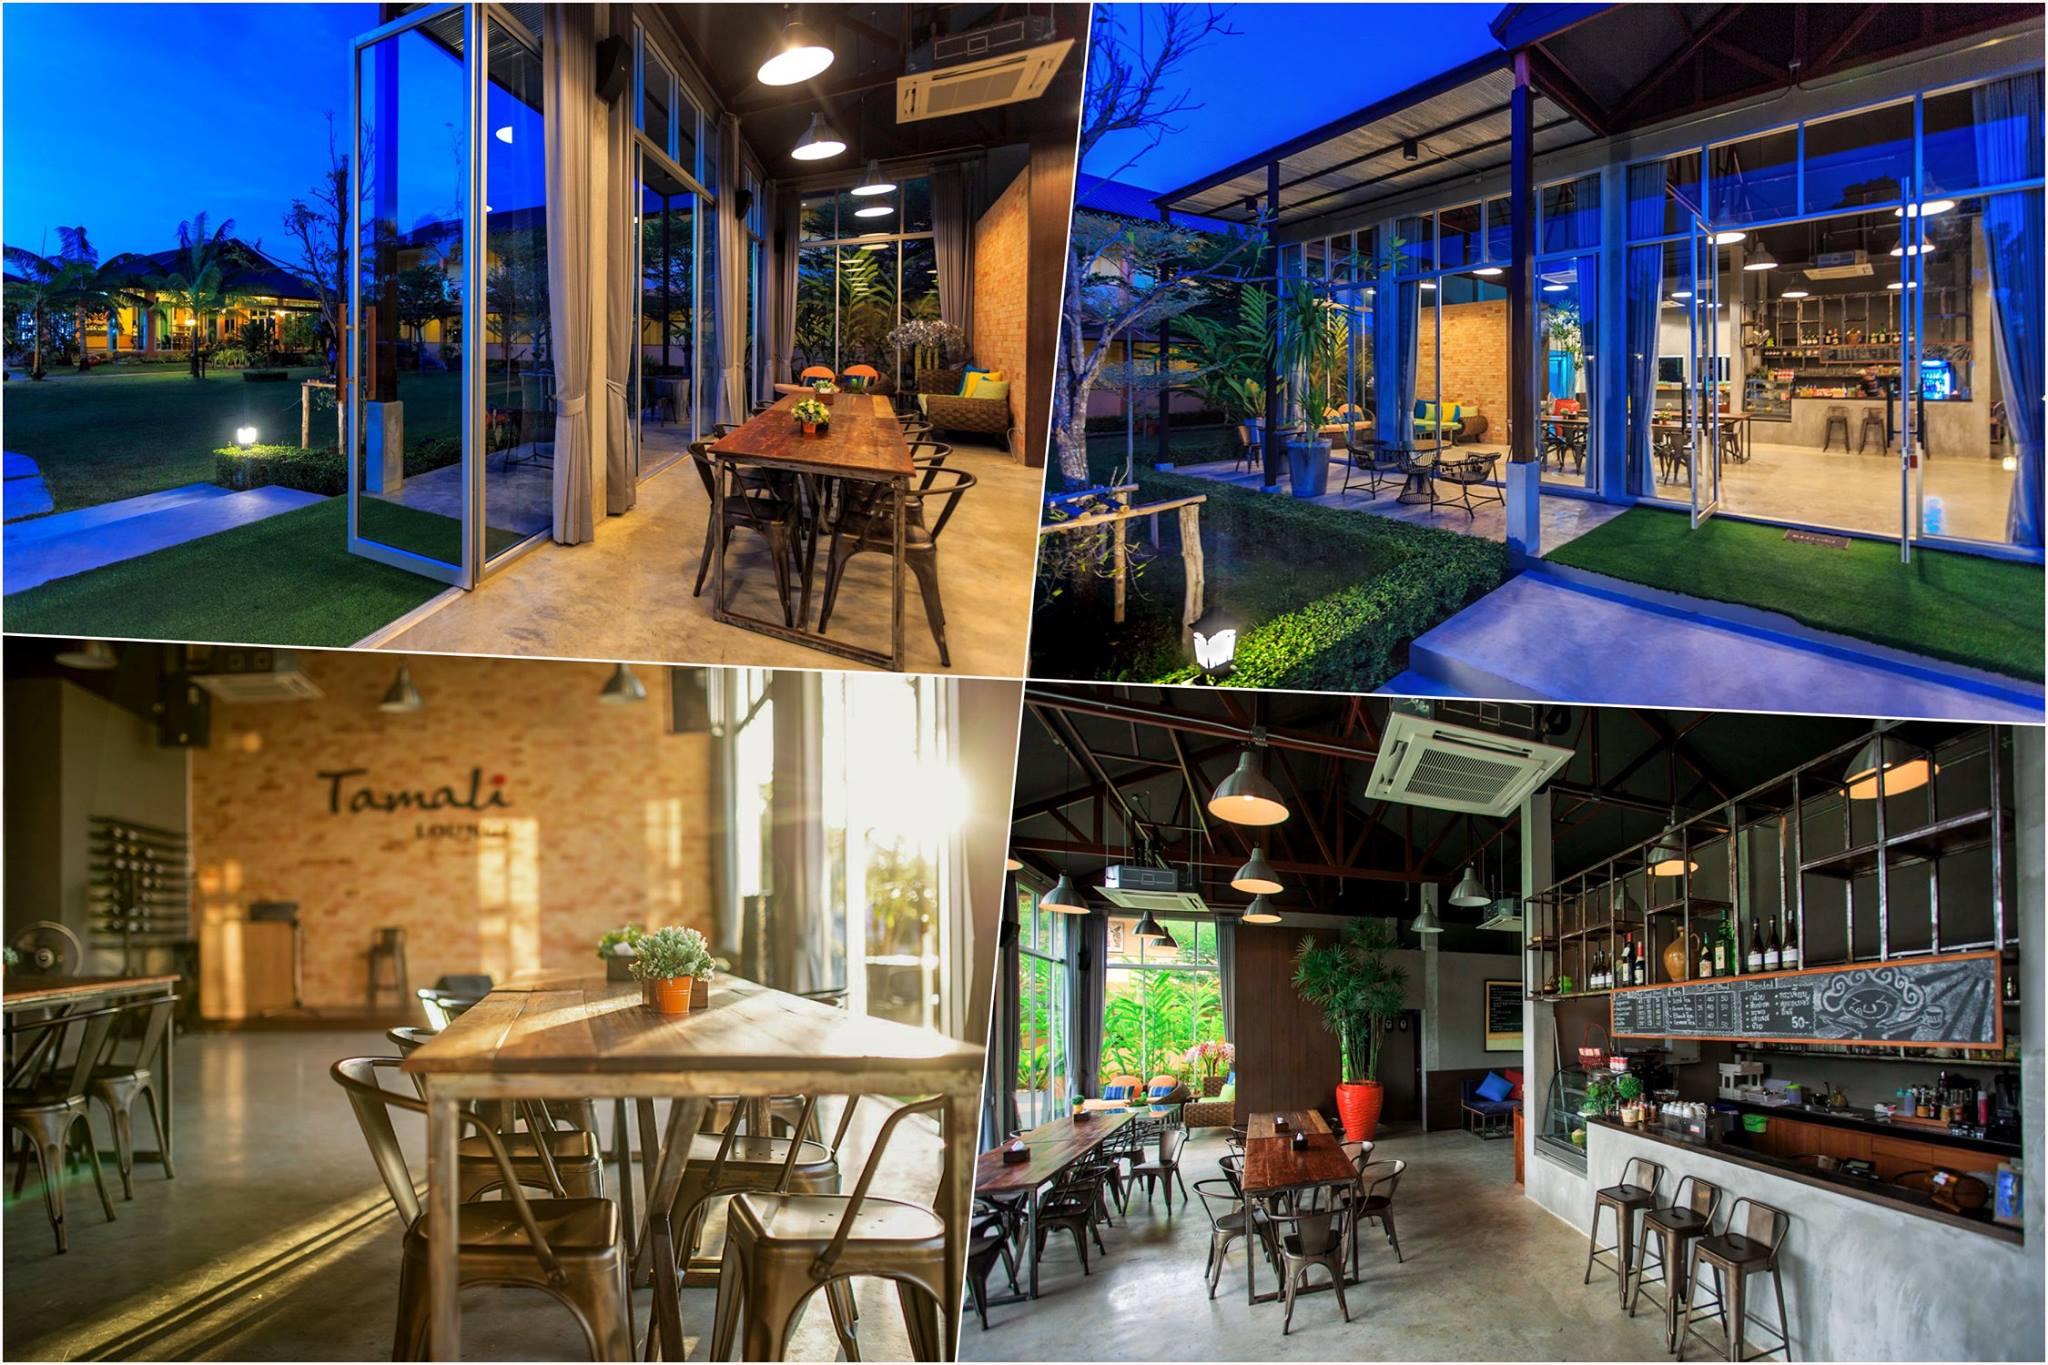 16.-Tamali-Lounge ถือเป็นคาเฟ่สวยๆในโรงแรมตะมาลีครับ-พร้อมกันข้างๆยังมีร้านอาหารอร่อยๆด้วยครับ พิกัด-:-พระพรหม-นครศรี Tamali-Hotel คาเฟ่,นครศรีธรรมราช,2021,จุดกิน,ของกิน,วิวหลักล้าน,ร้านกาแฟ